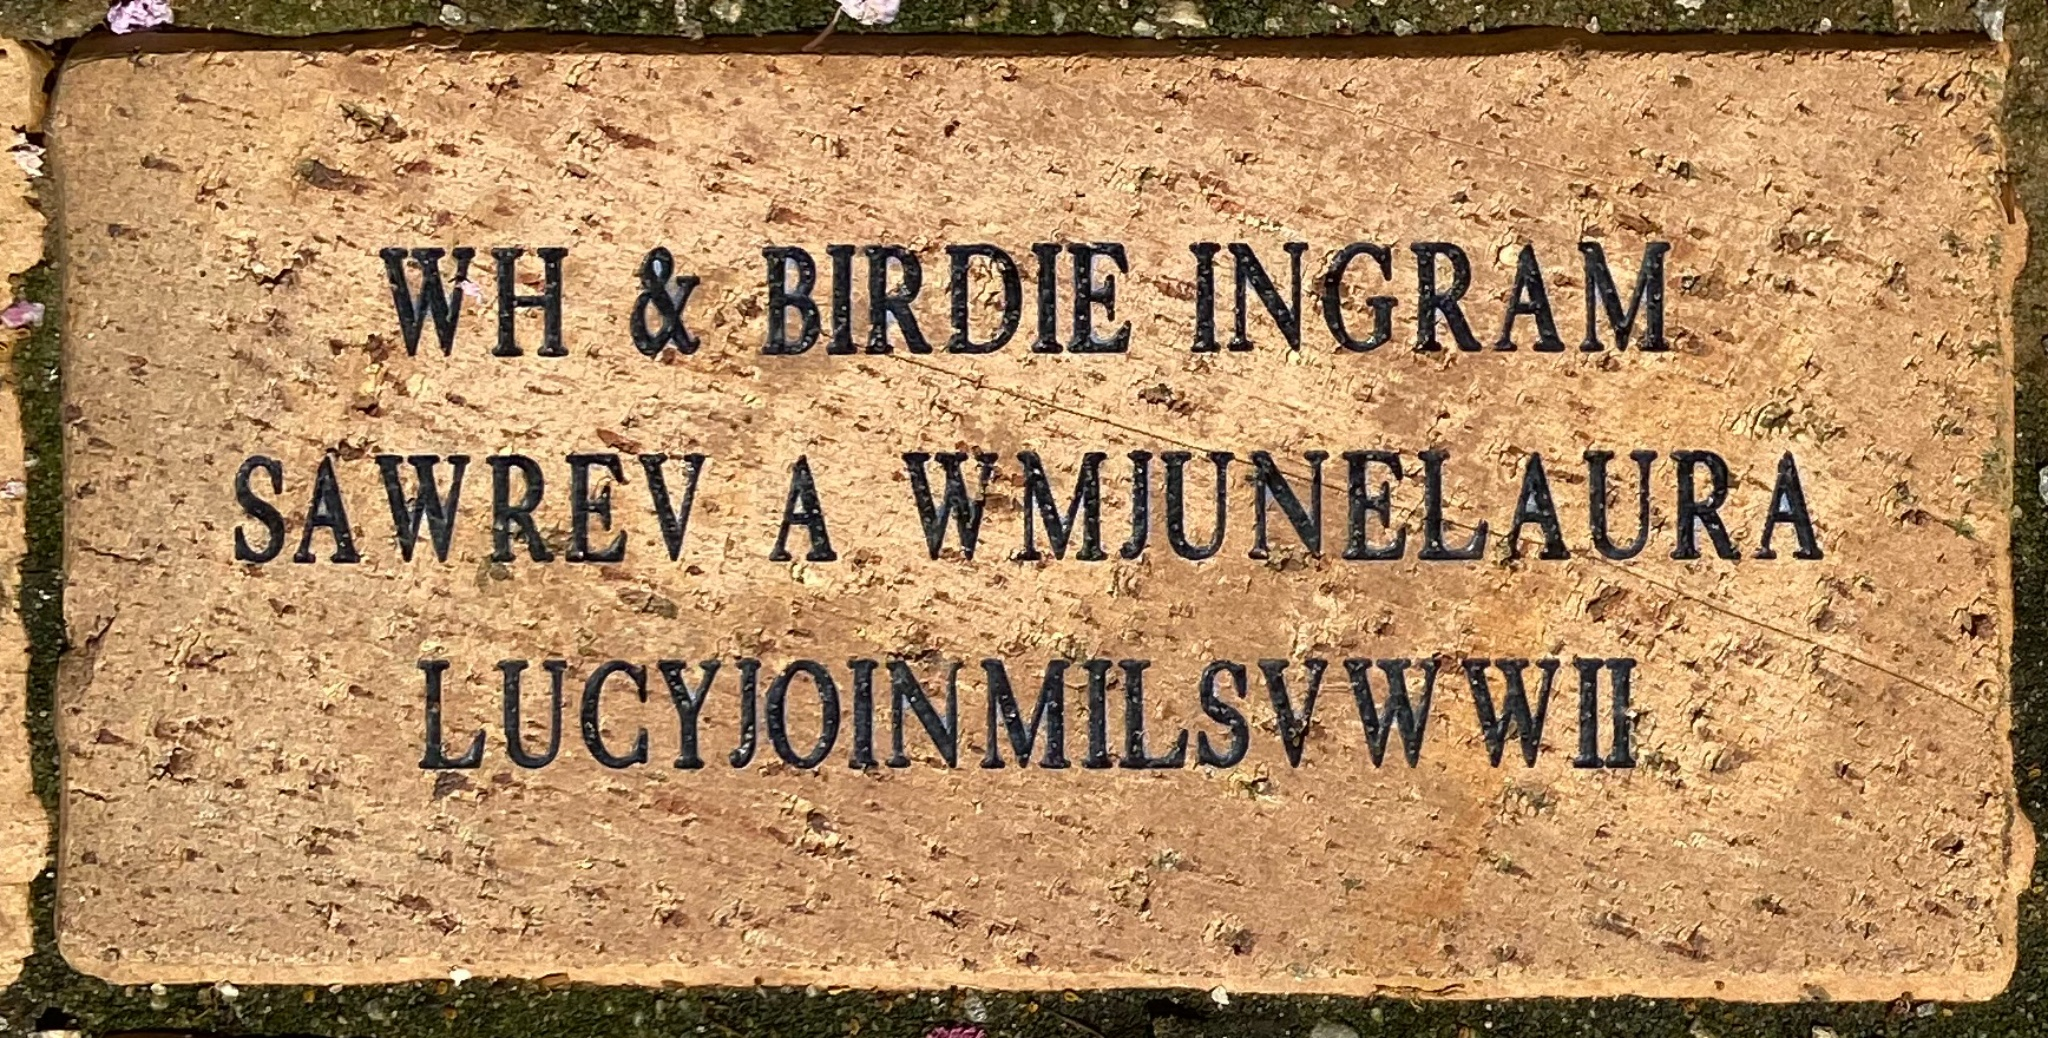 WH & BIRDIE INGRAM SAWREV A WMJUNELAURA LUCYJOINMILSVWWII